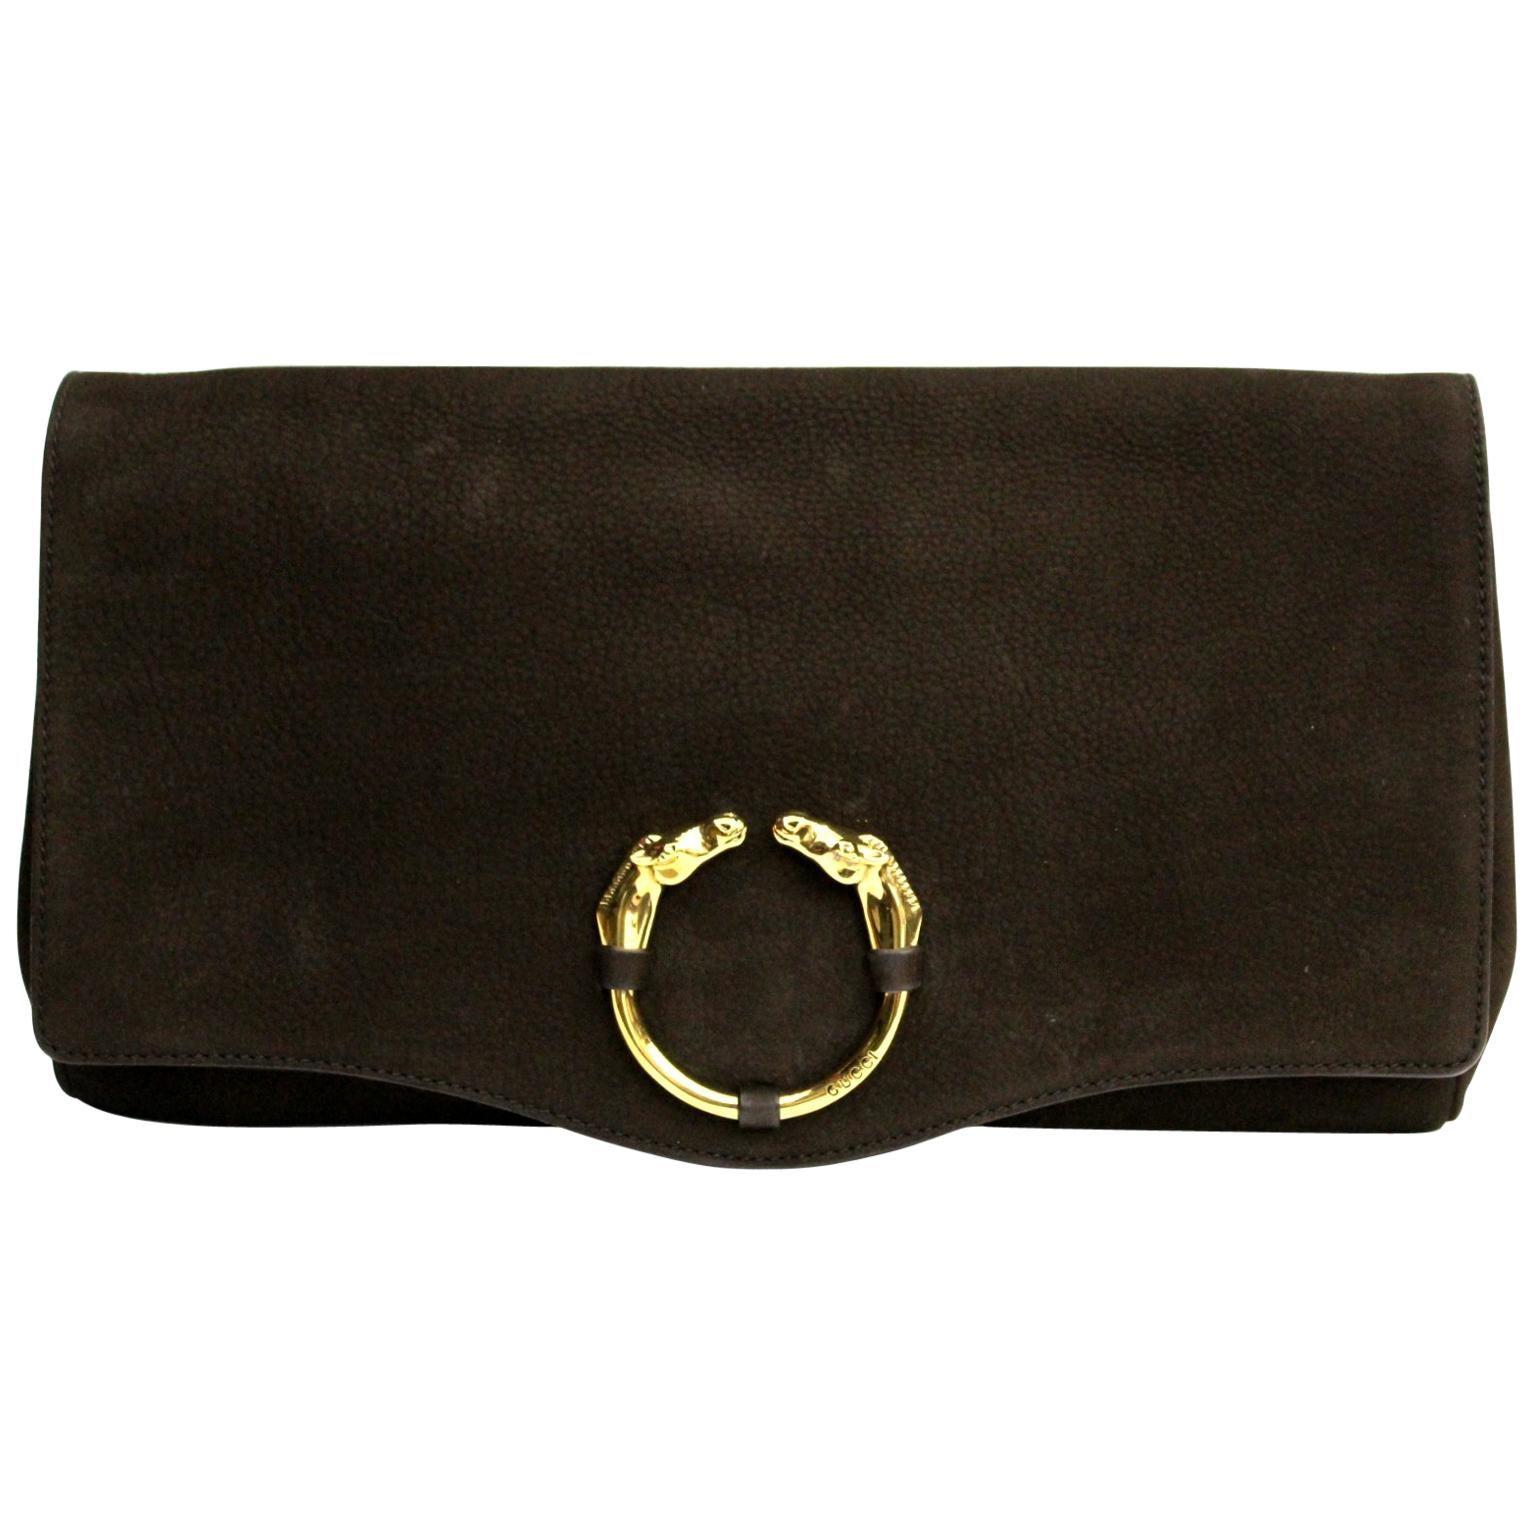 Gucci Brown Suede Clutch Bag